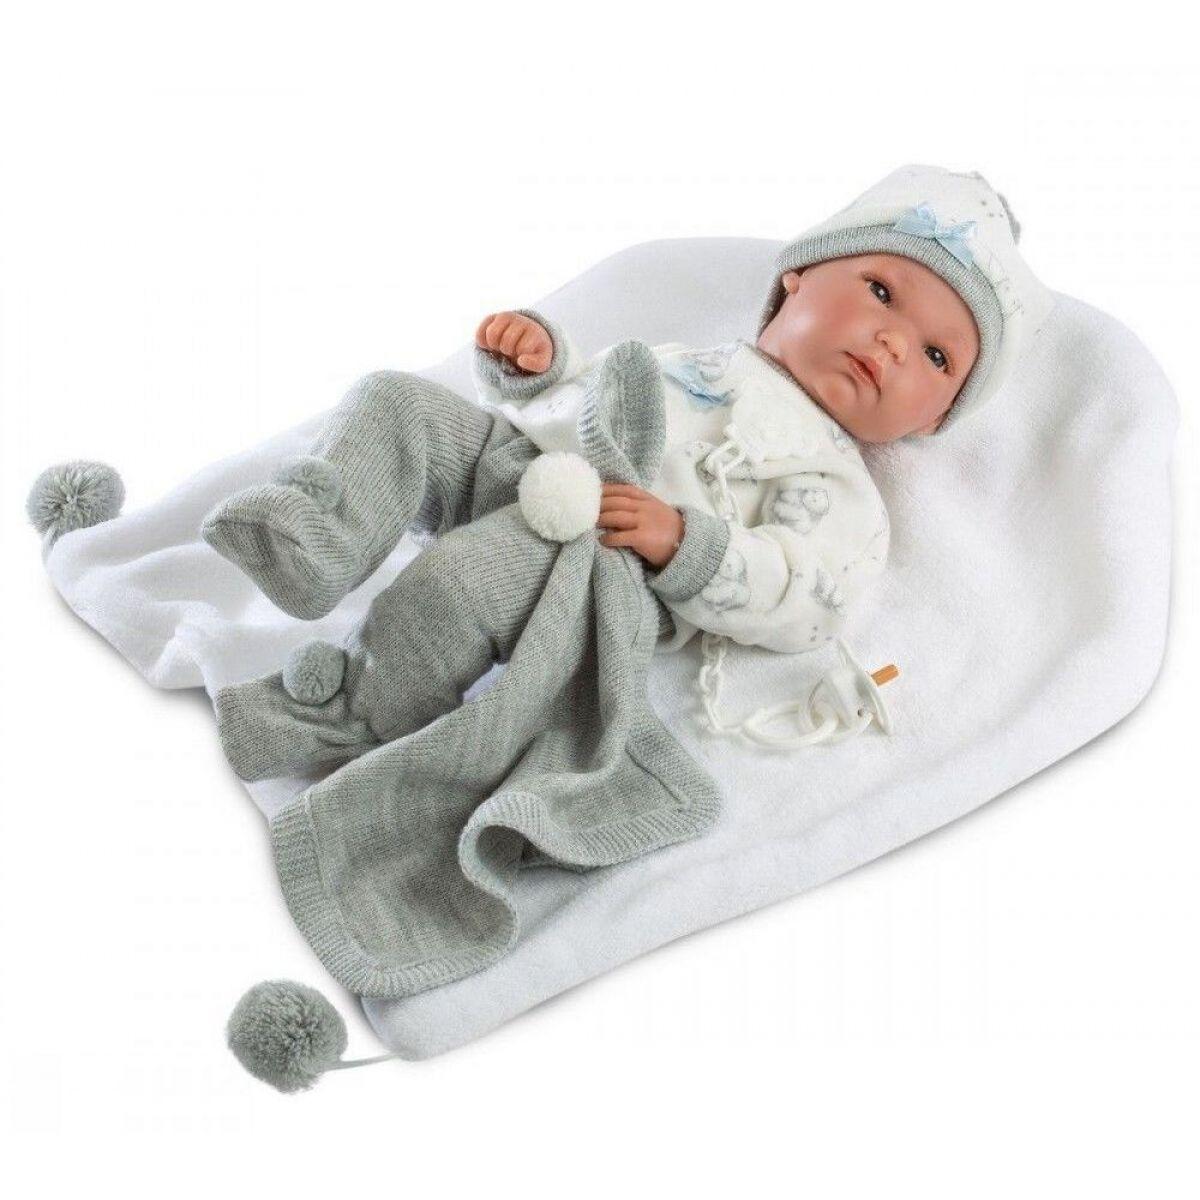 Llorens panenka New Born chlapeček 63545